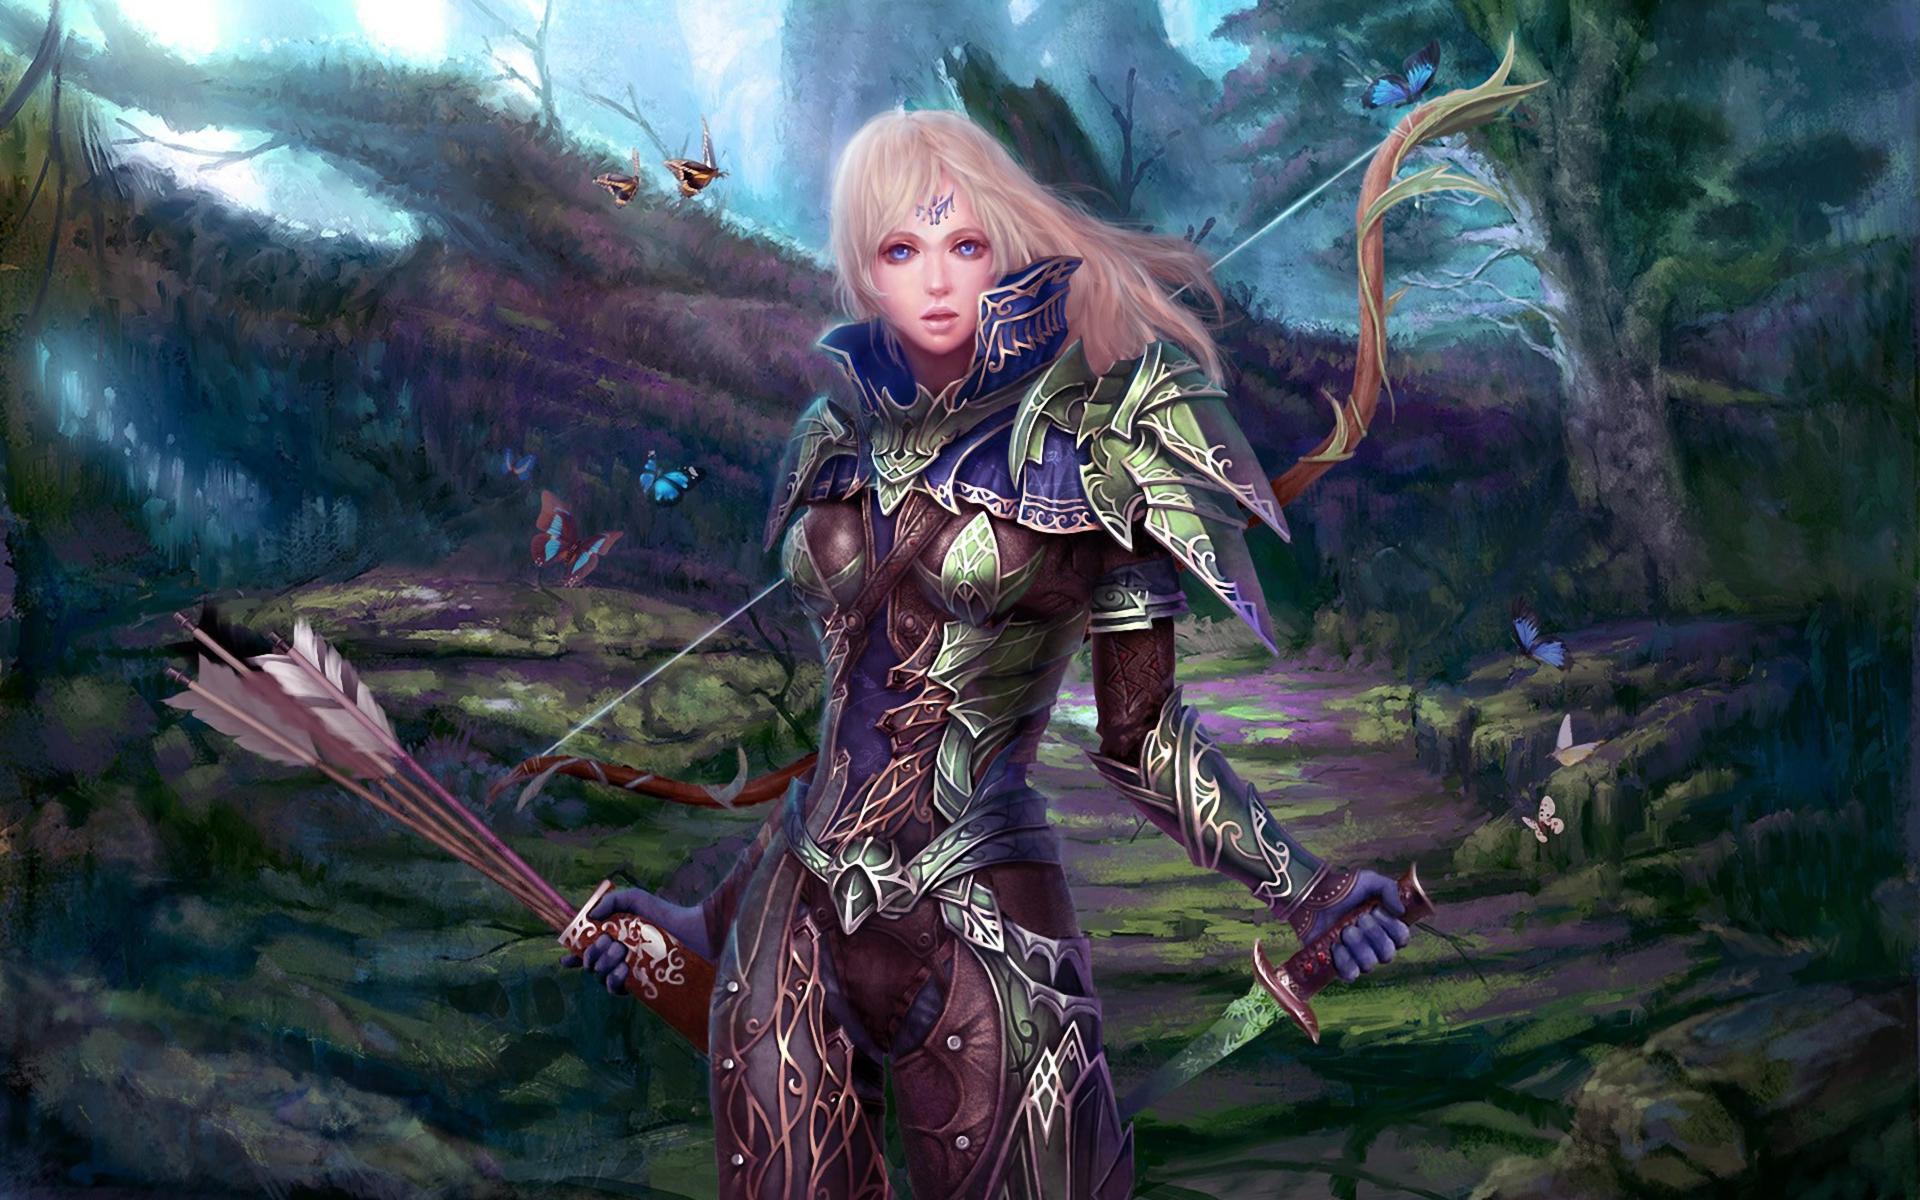 Fantasy Female Archer Warrior Hd Wallpaper Wallpaper List 1920x1200